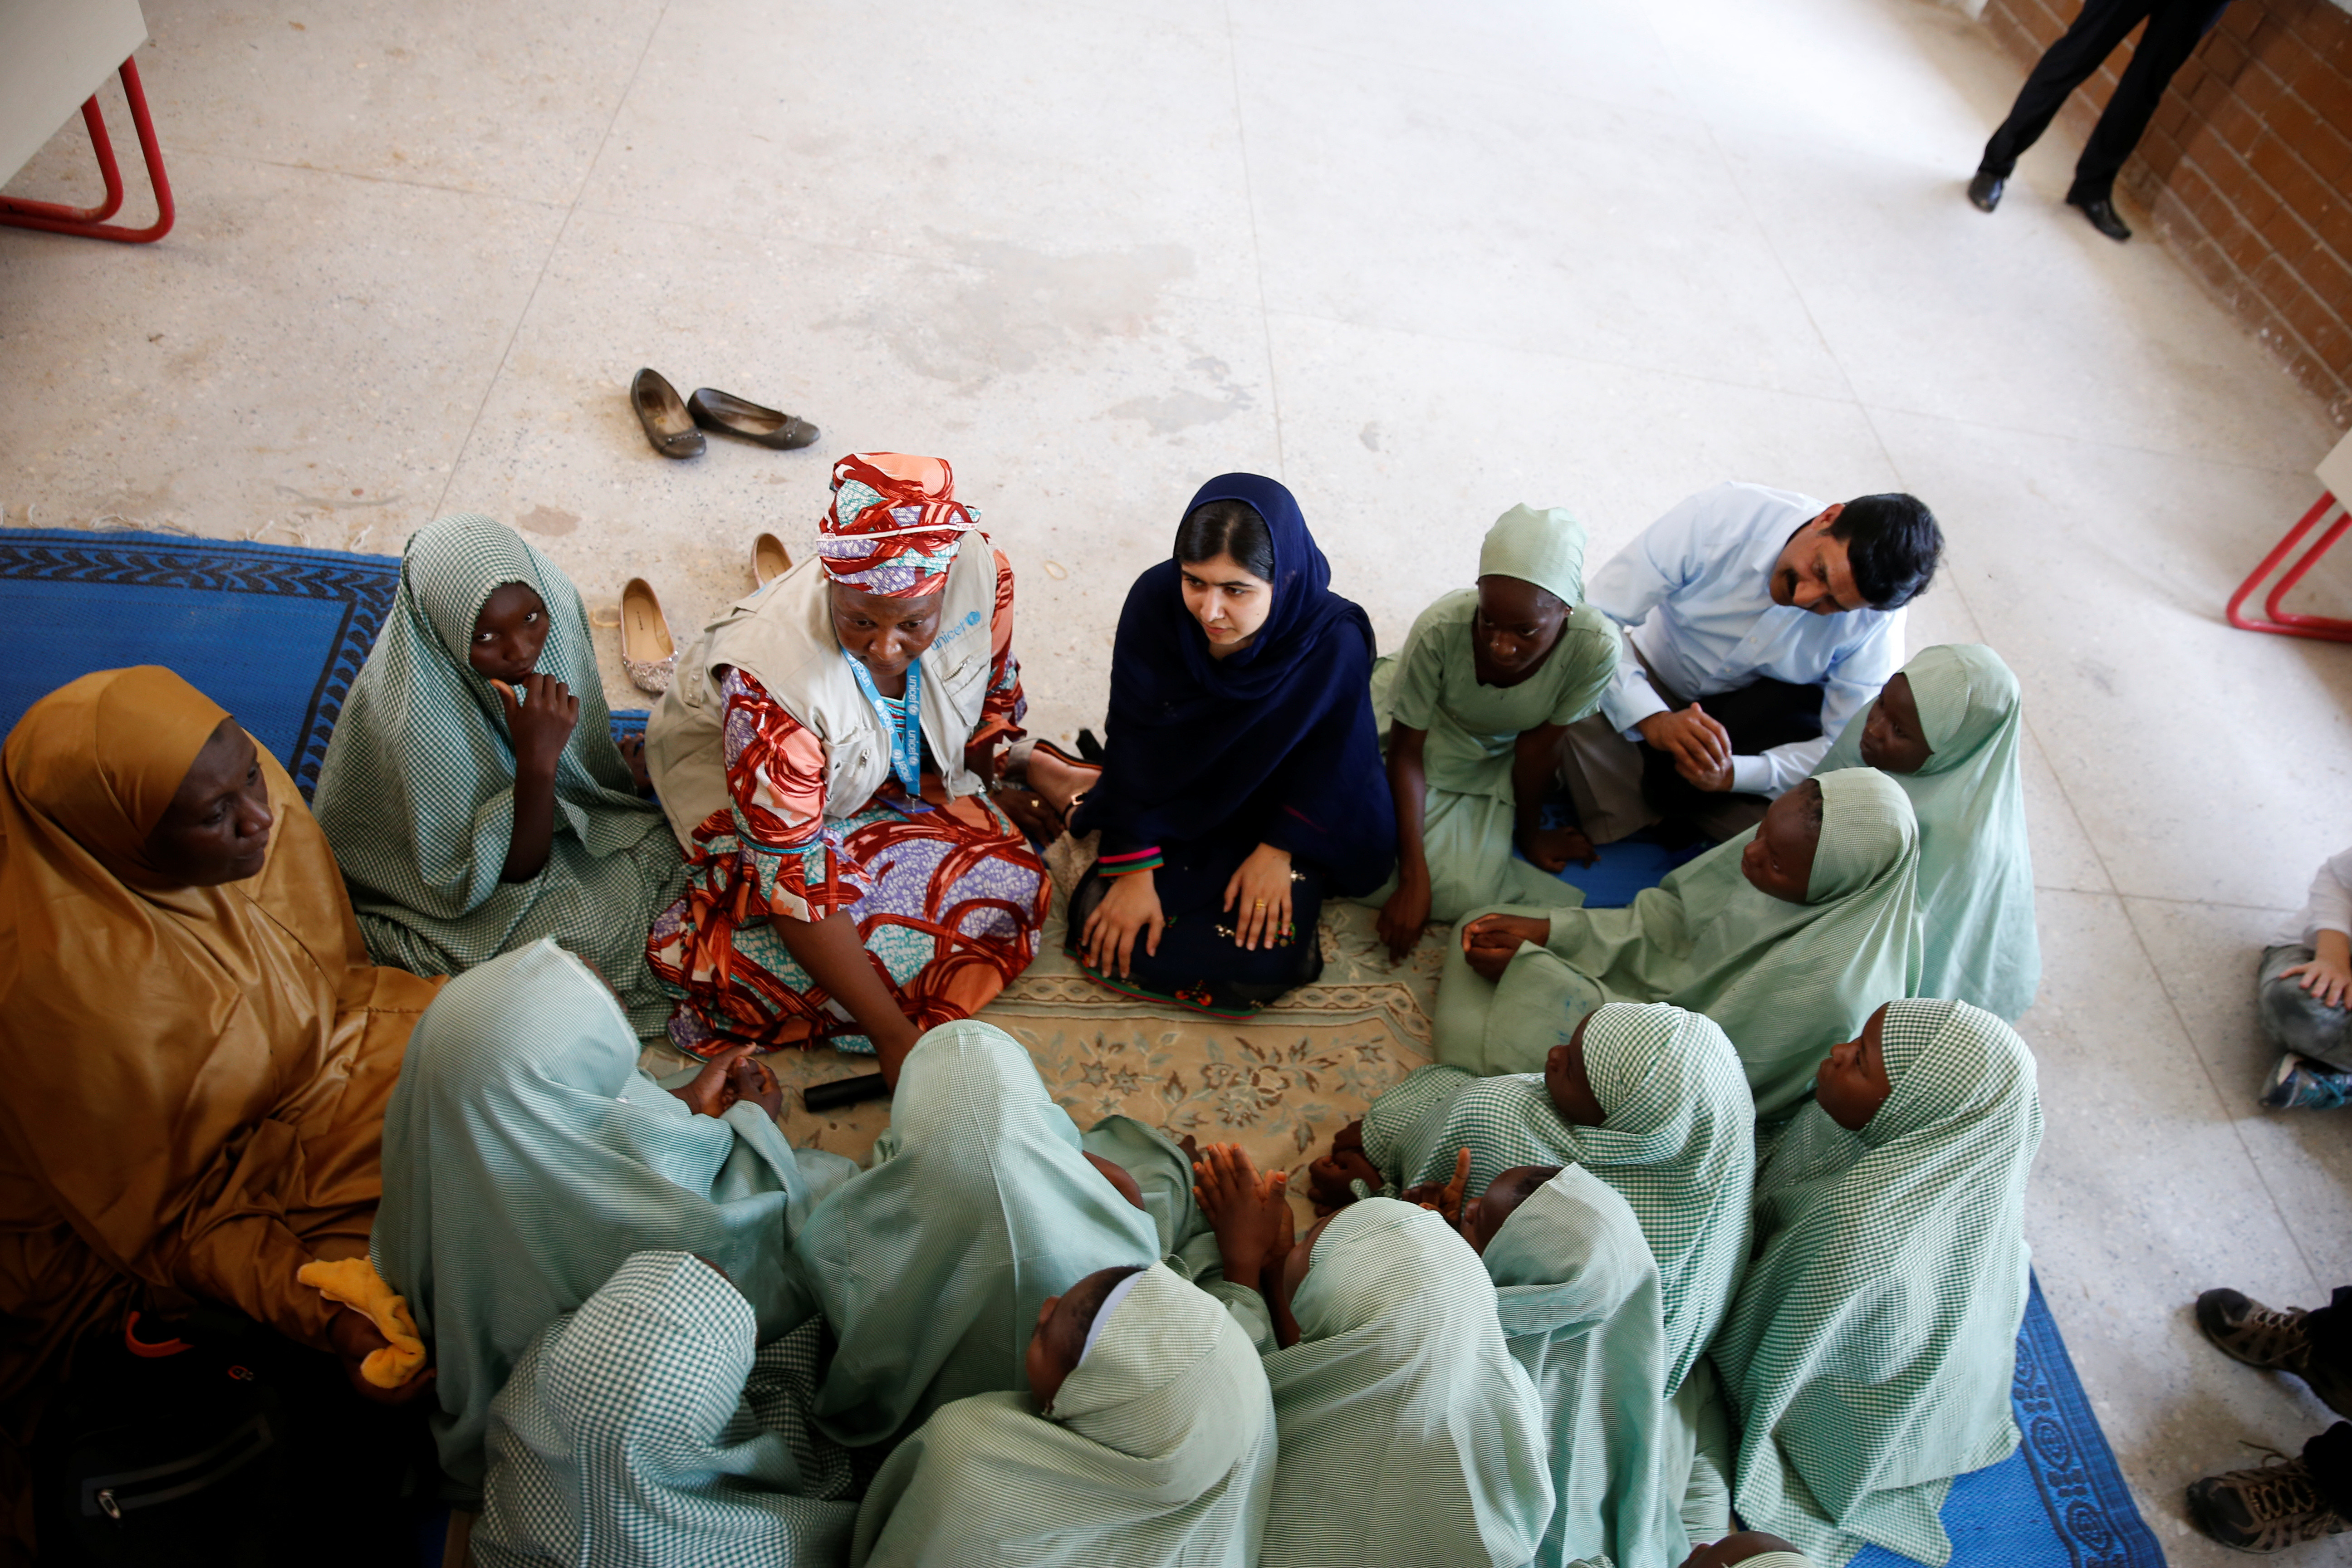 Female gender equality education skills school Sub-Saharan Africa